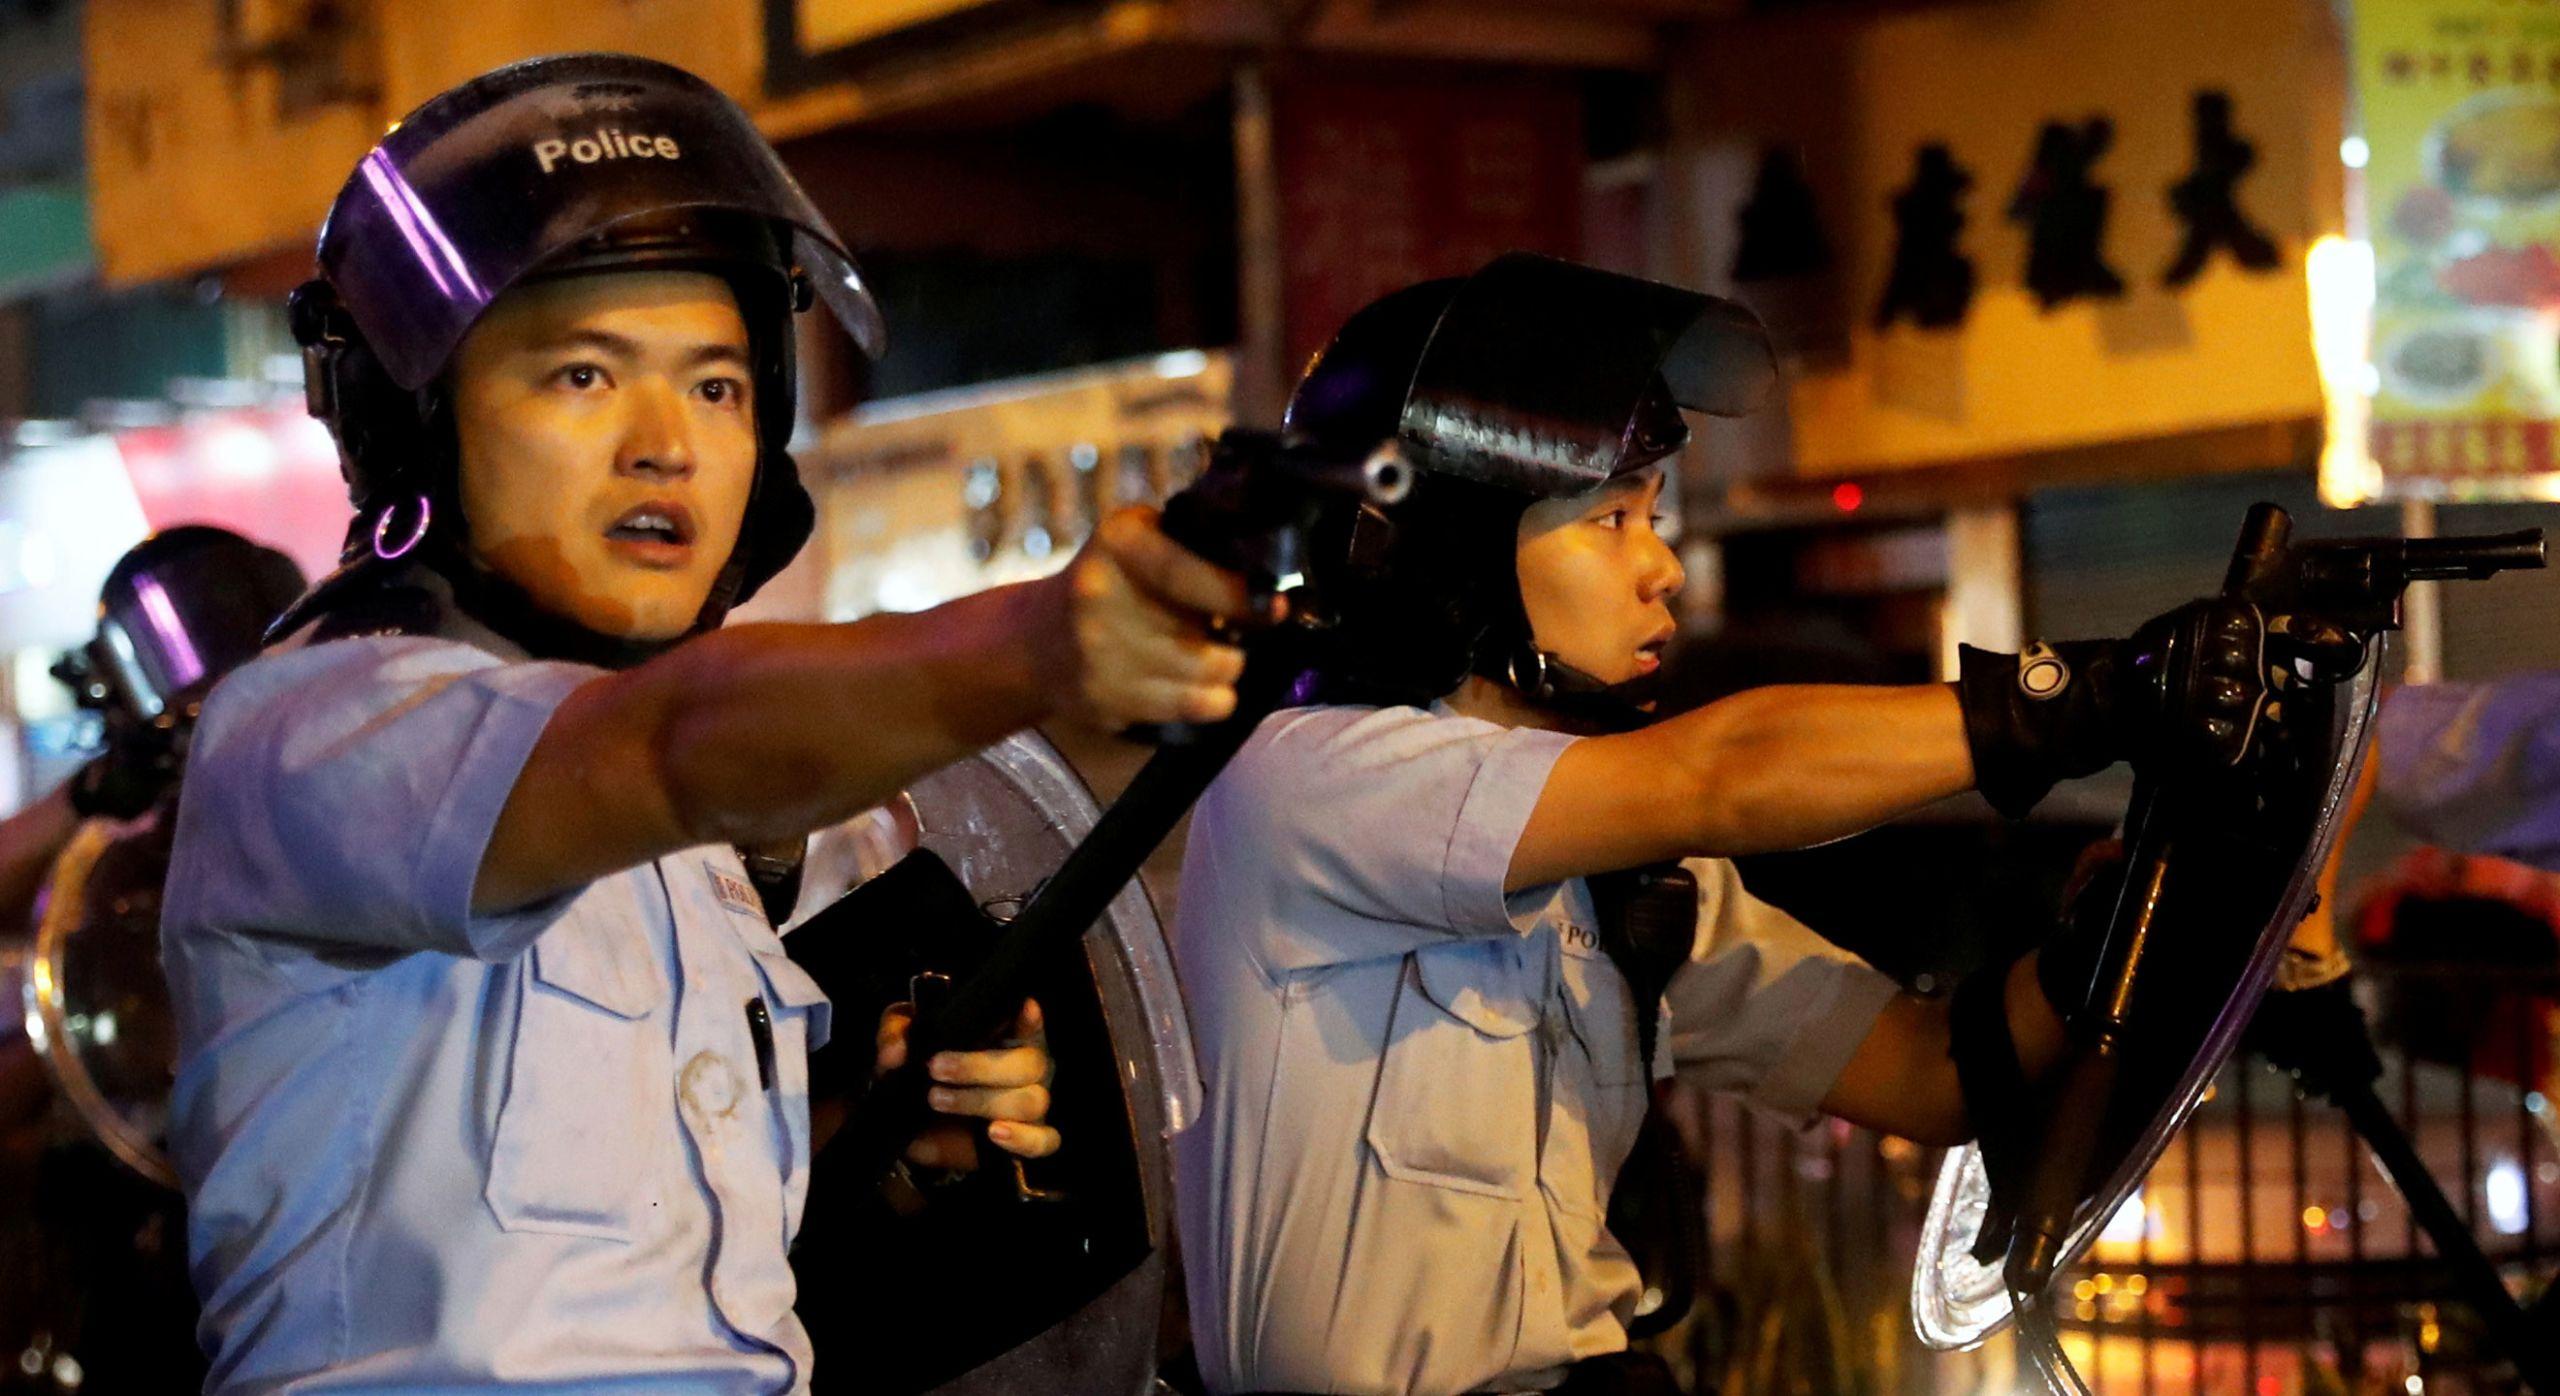 Police point guns